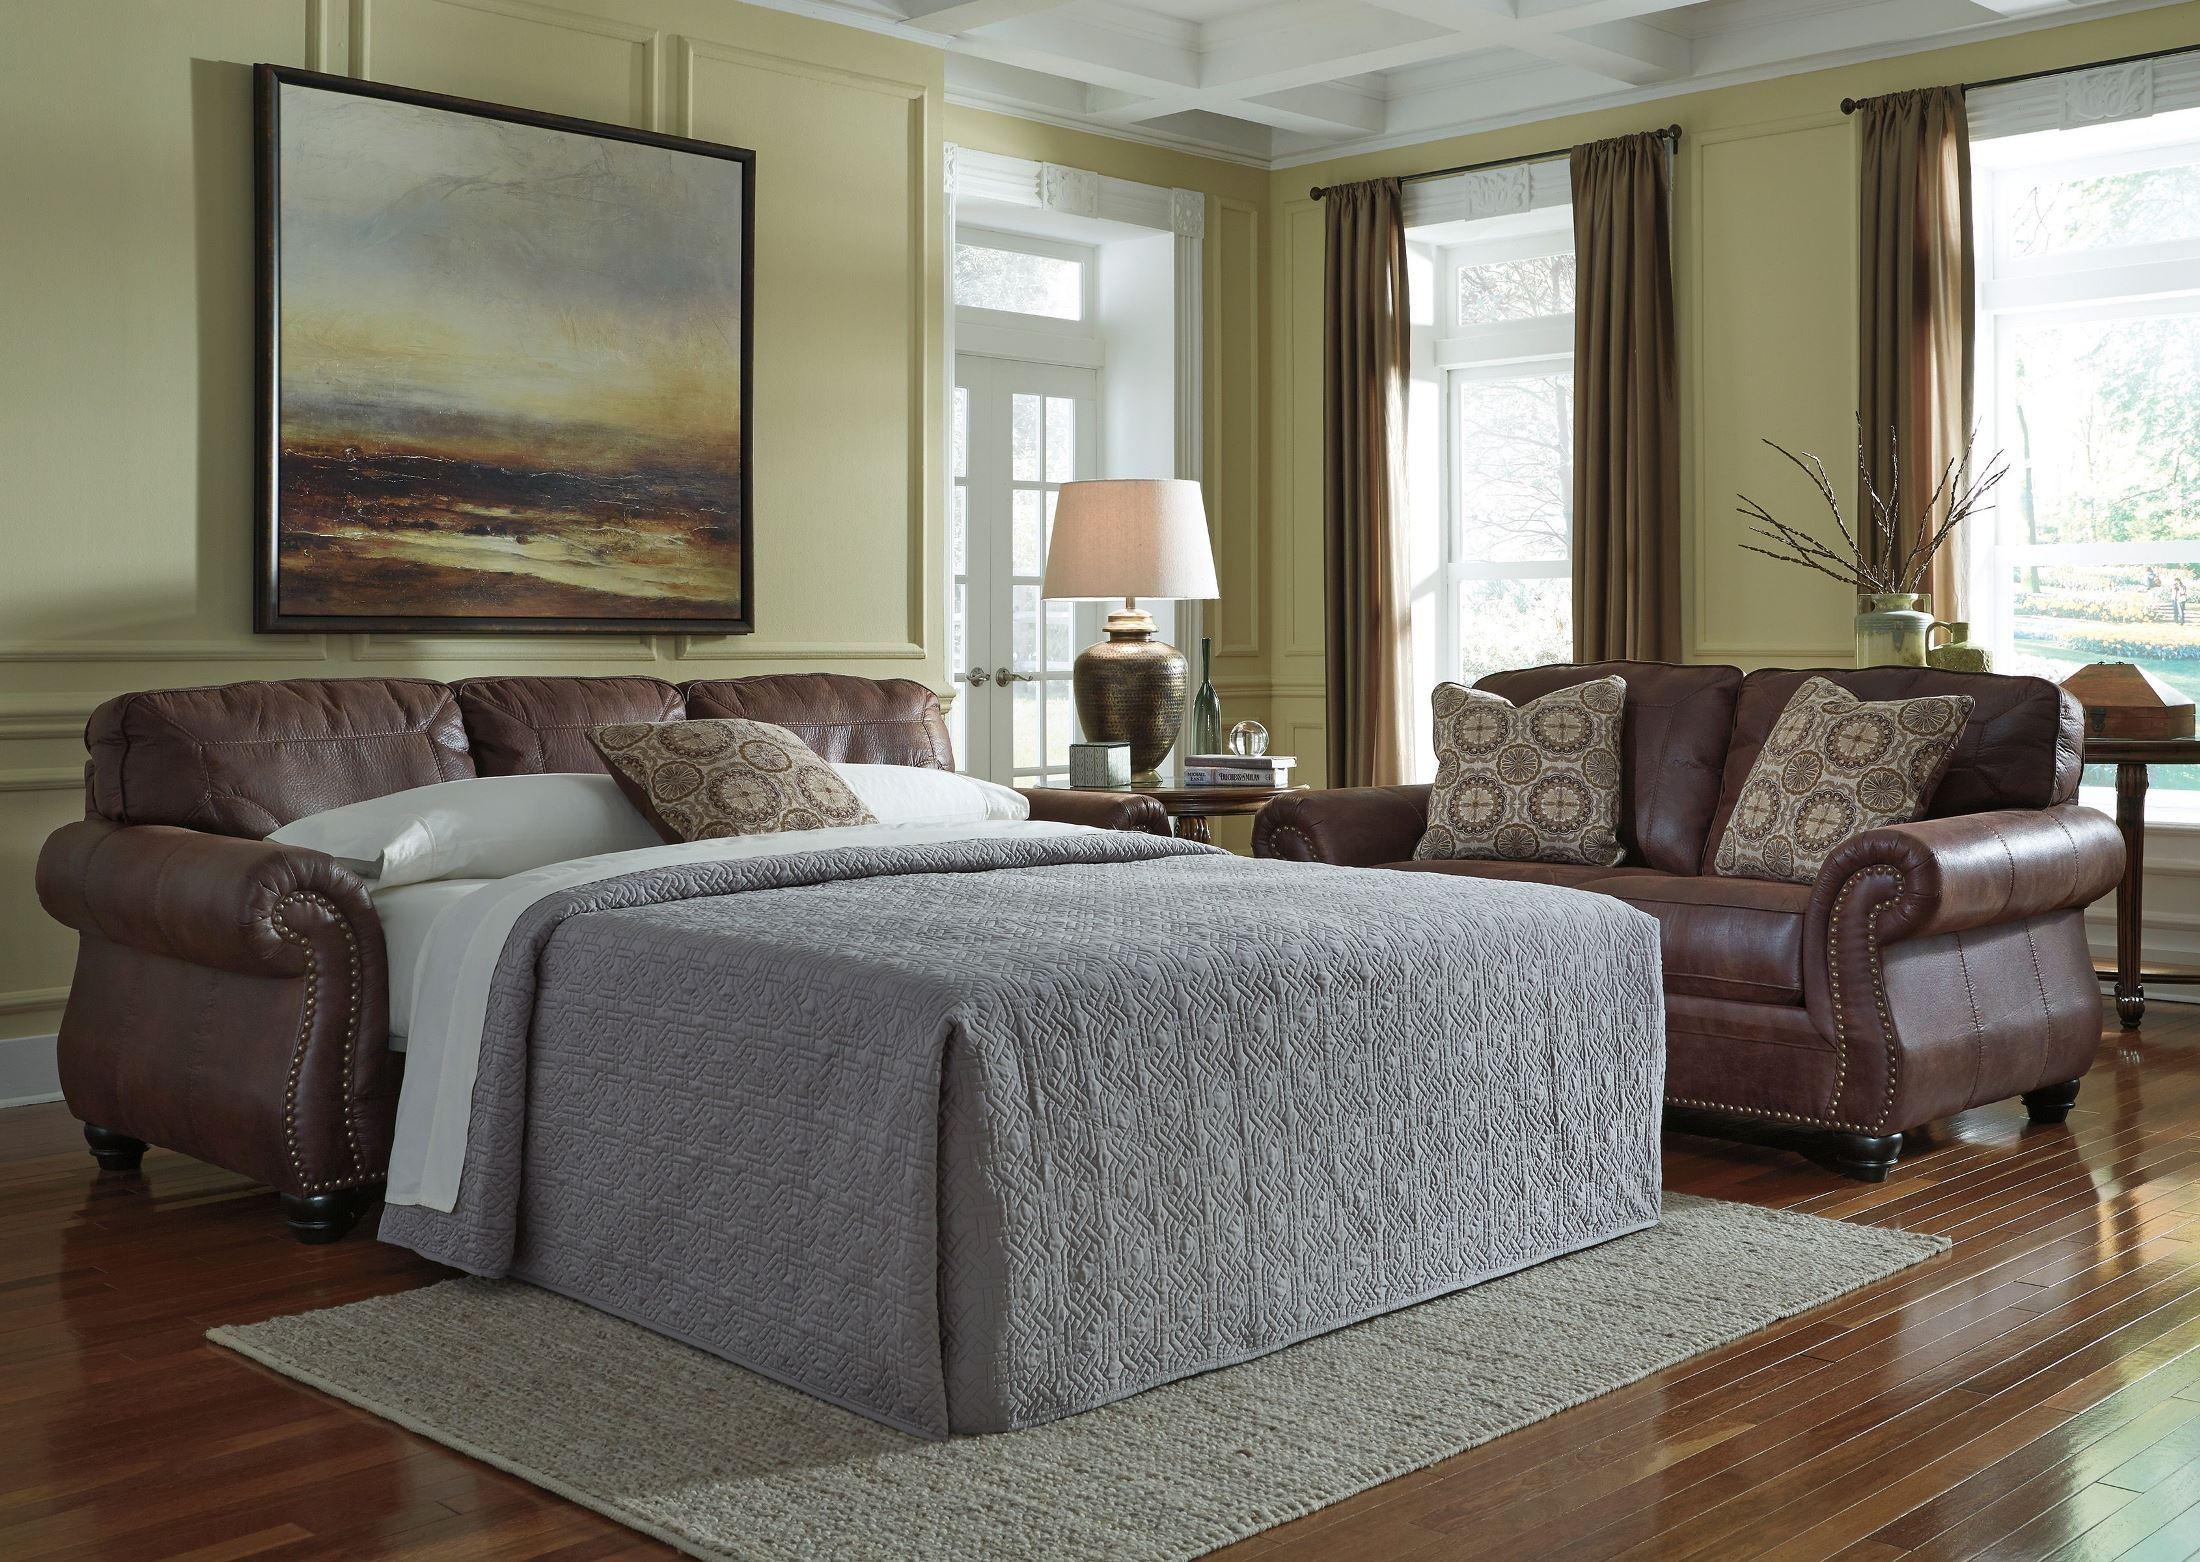 Breville Espresso Queen Sofa Sleeper From Ashley 8000339